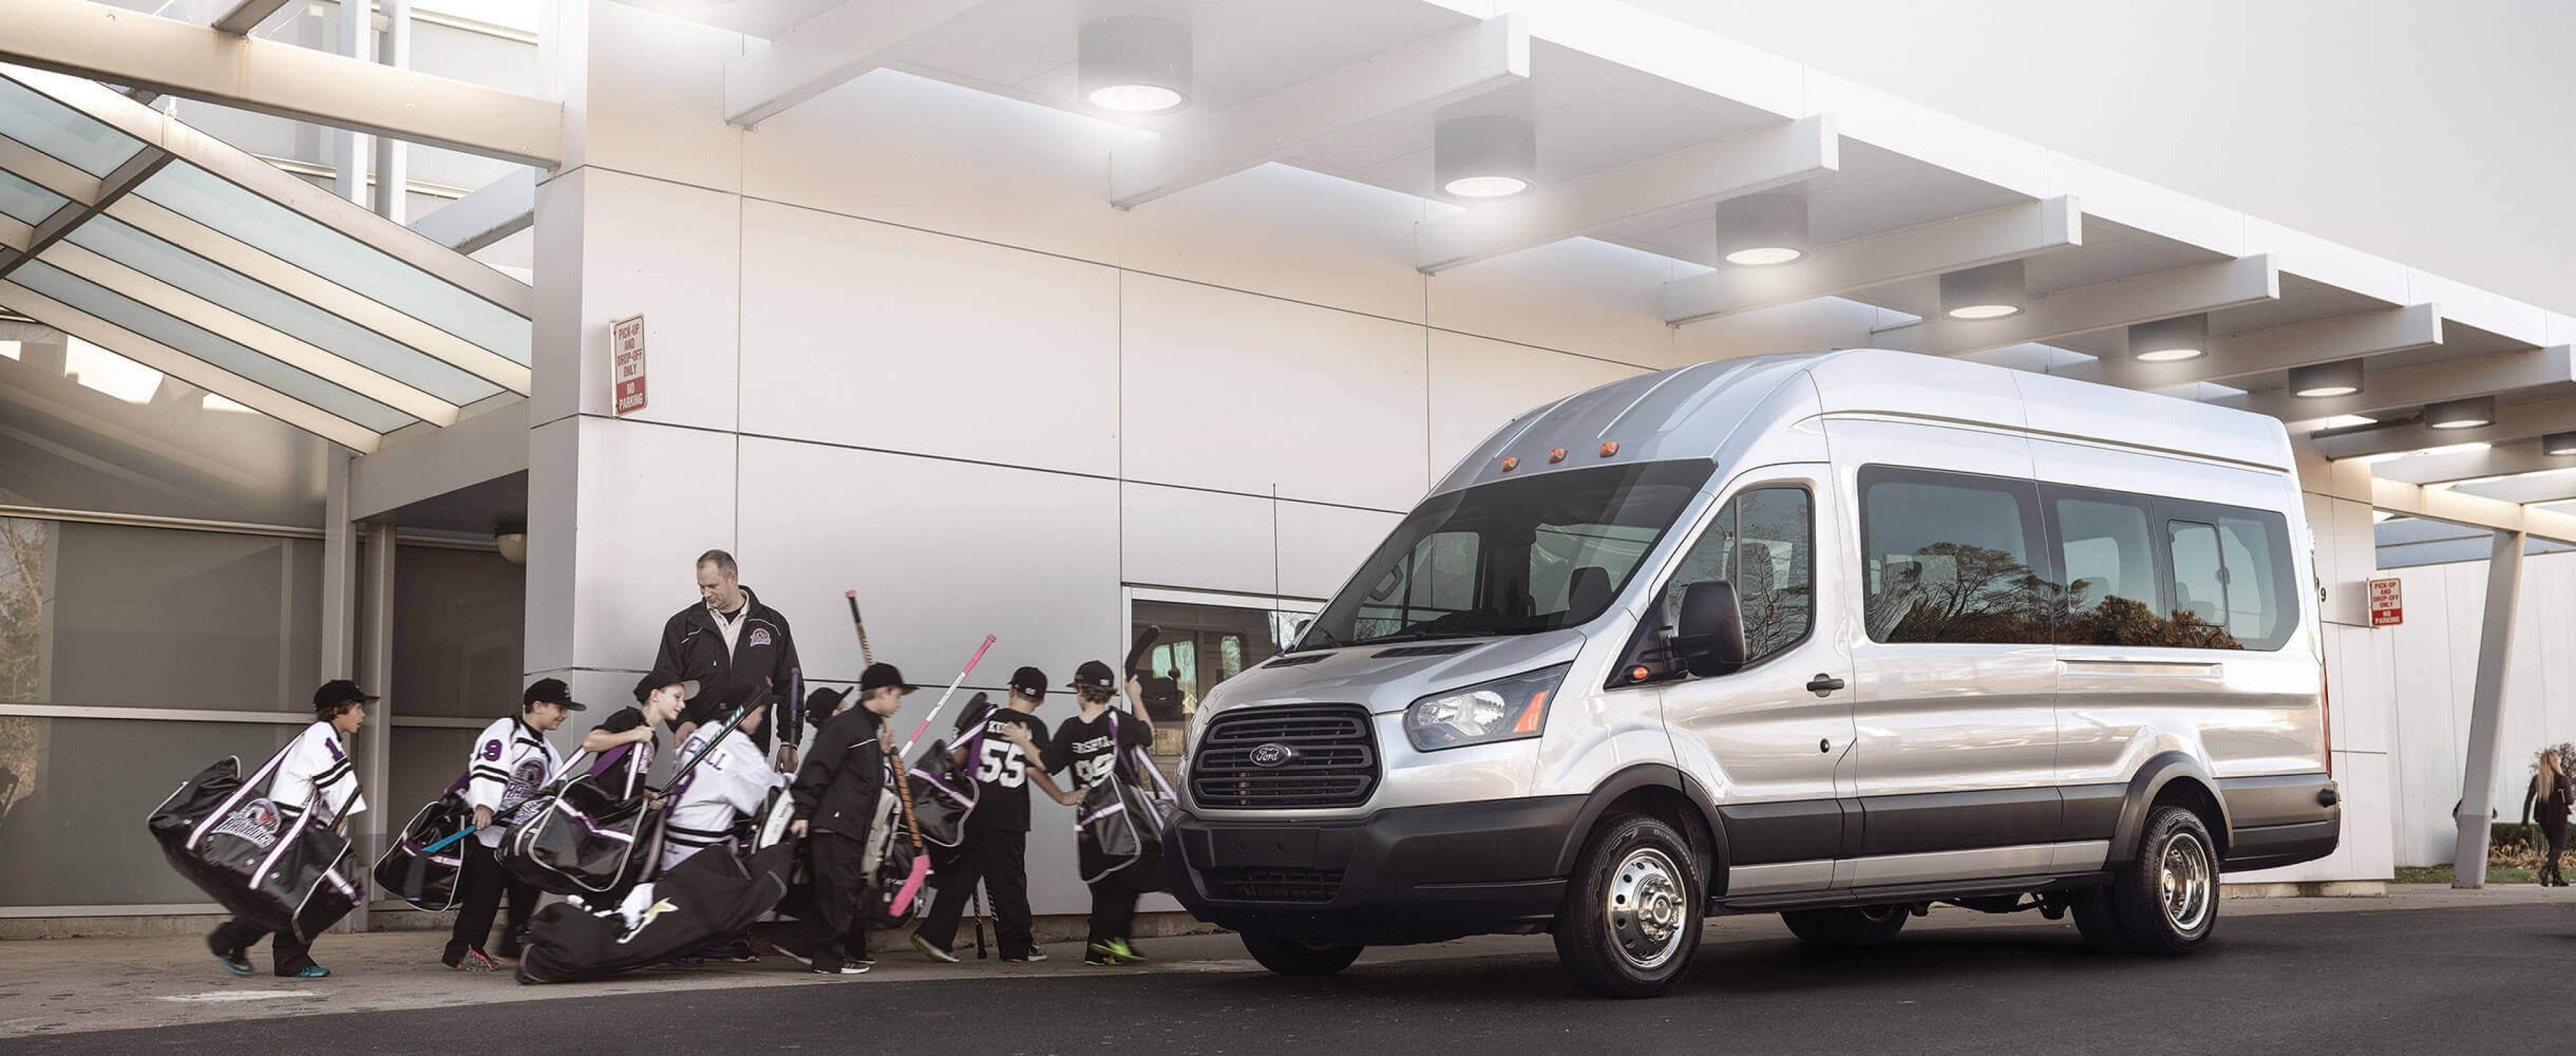 Truck Rental Houston >> Van Rental In Houston Minivan Passenger Avis Rent A Car